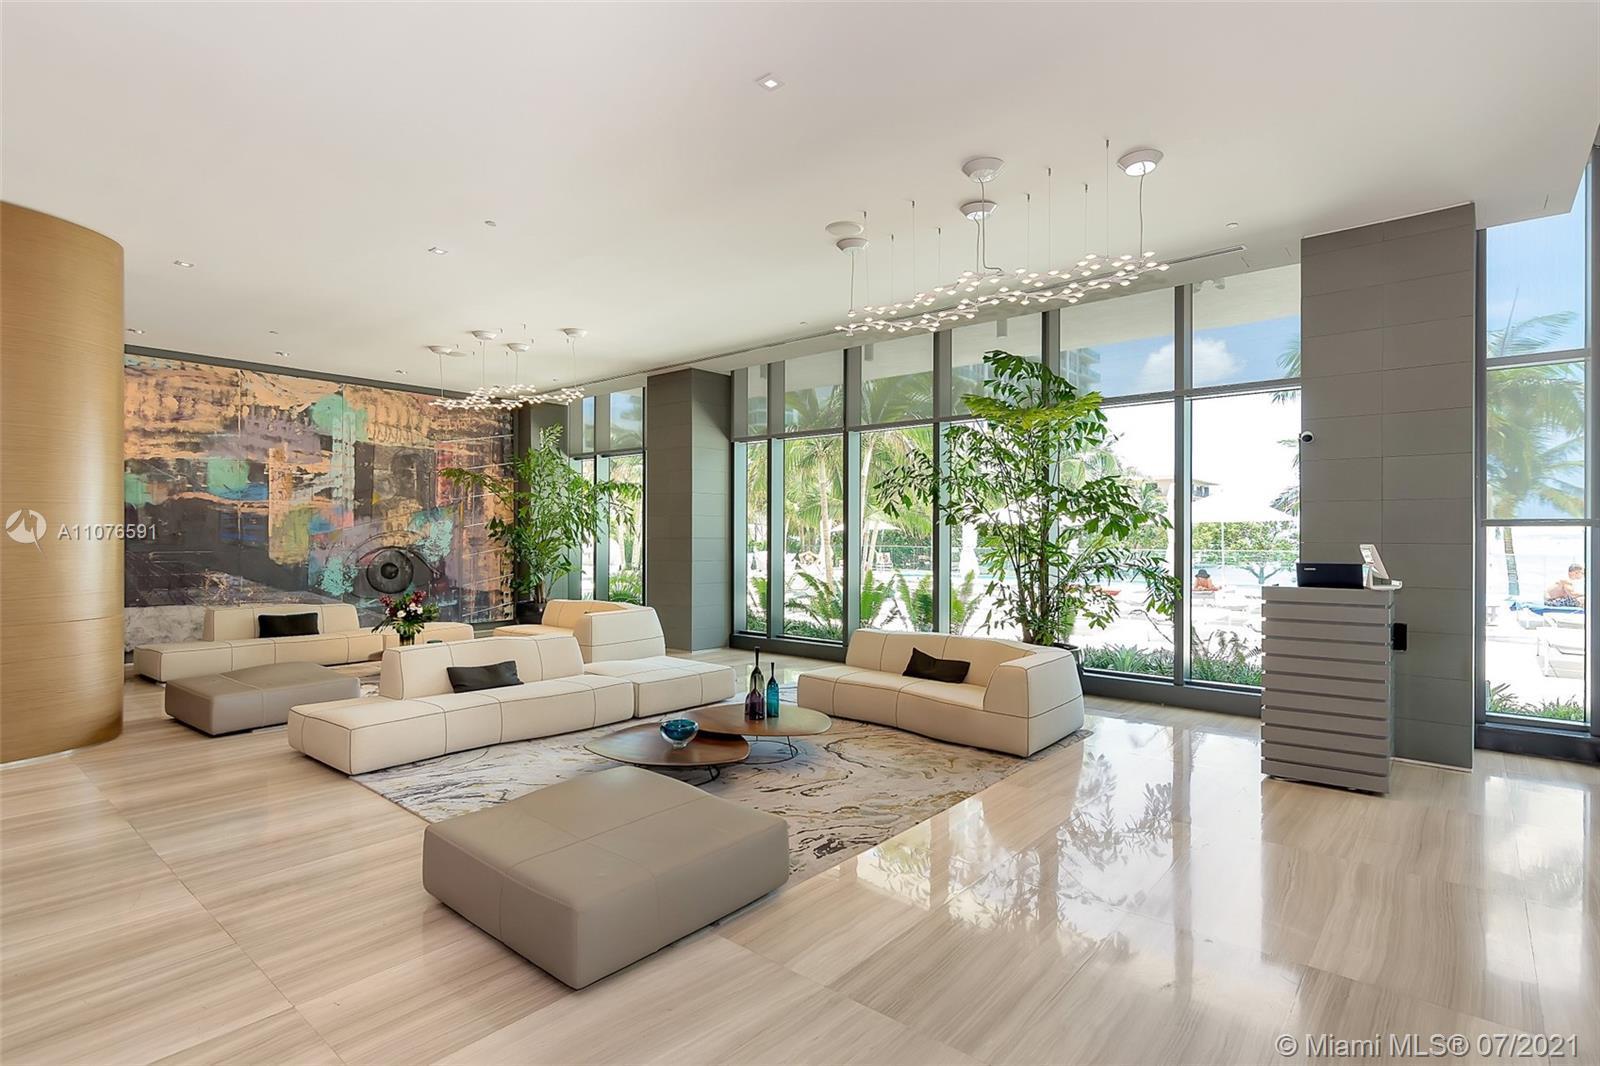 Live on the prestigious building of Miami, The Icon Bay Condo, this beautiful 2/2 has an amazing vie